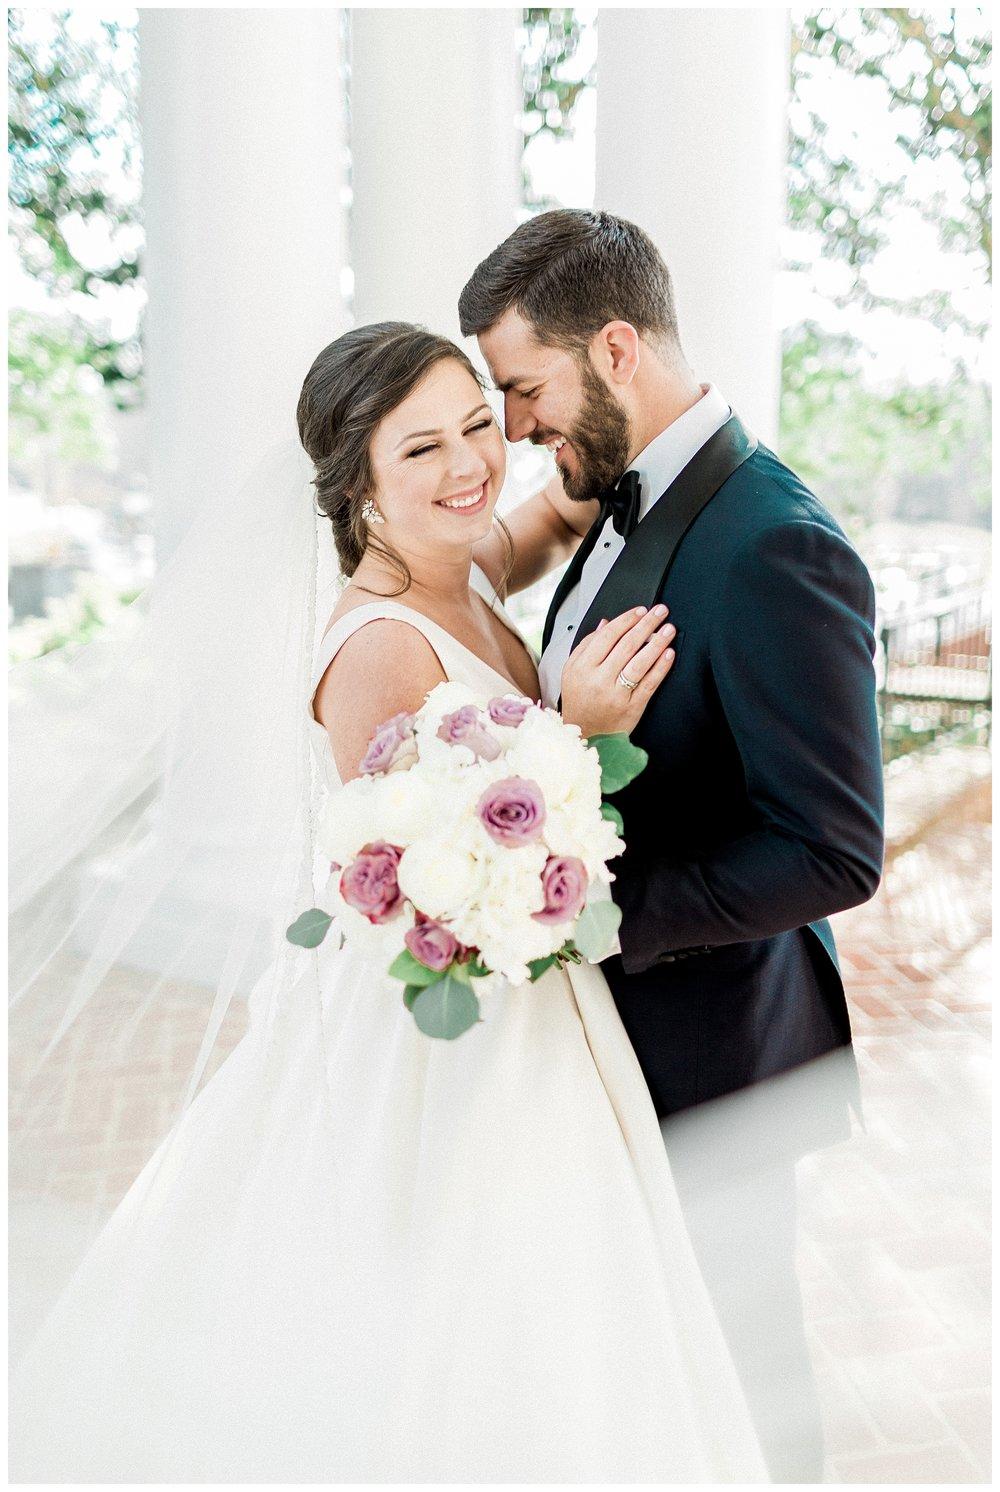 Country Club of Virginia Wedding | Richmond Wedding Photographer_0122.jpg